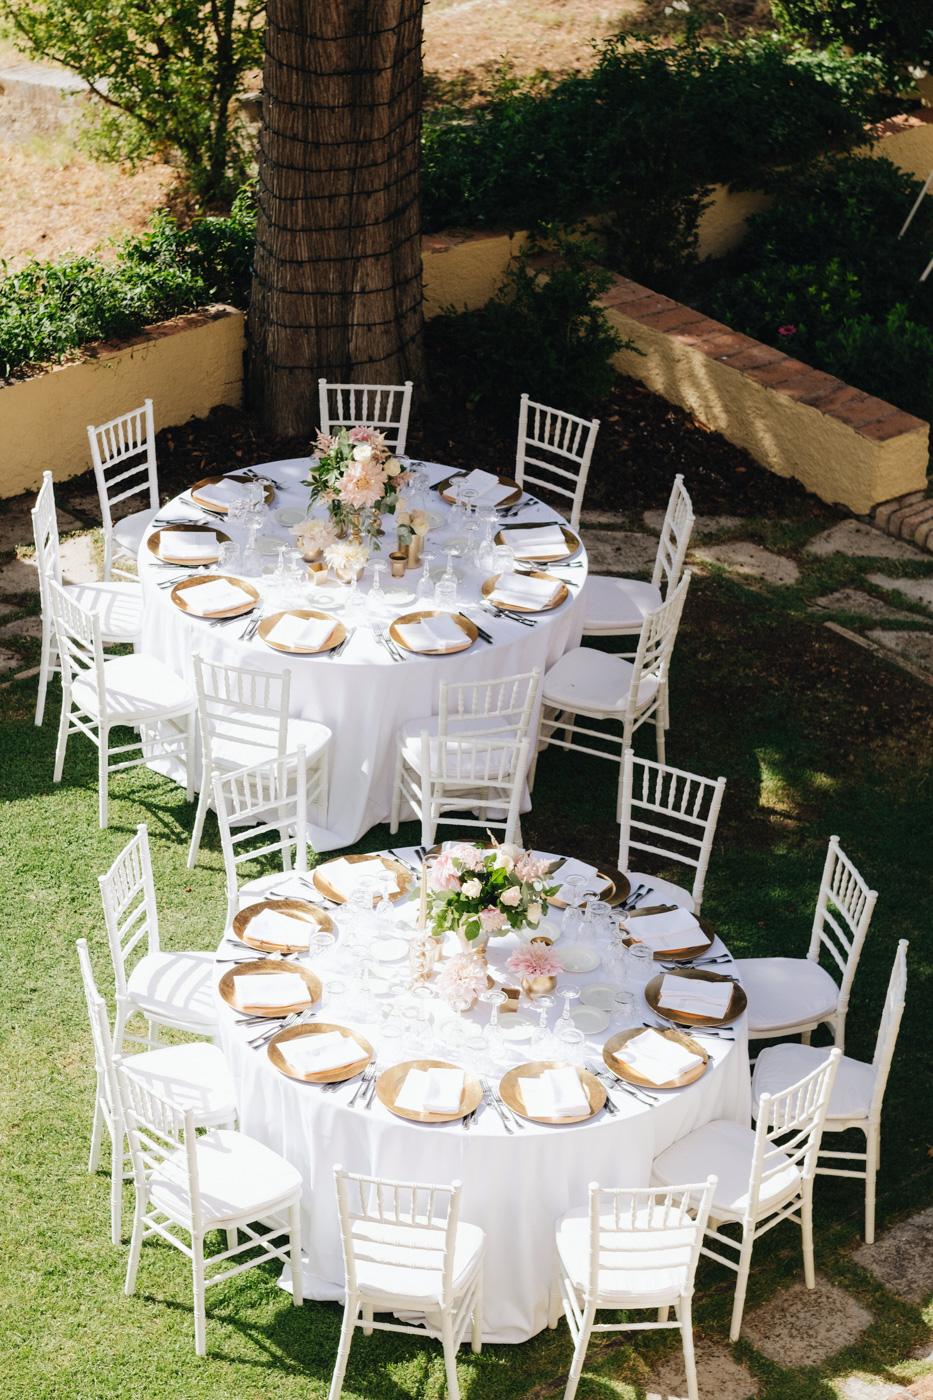 Matrimoni all'italiana wedding photographer italy-18.jpg